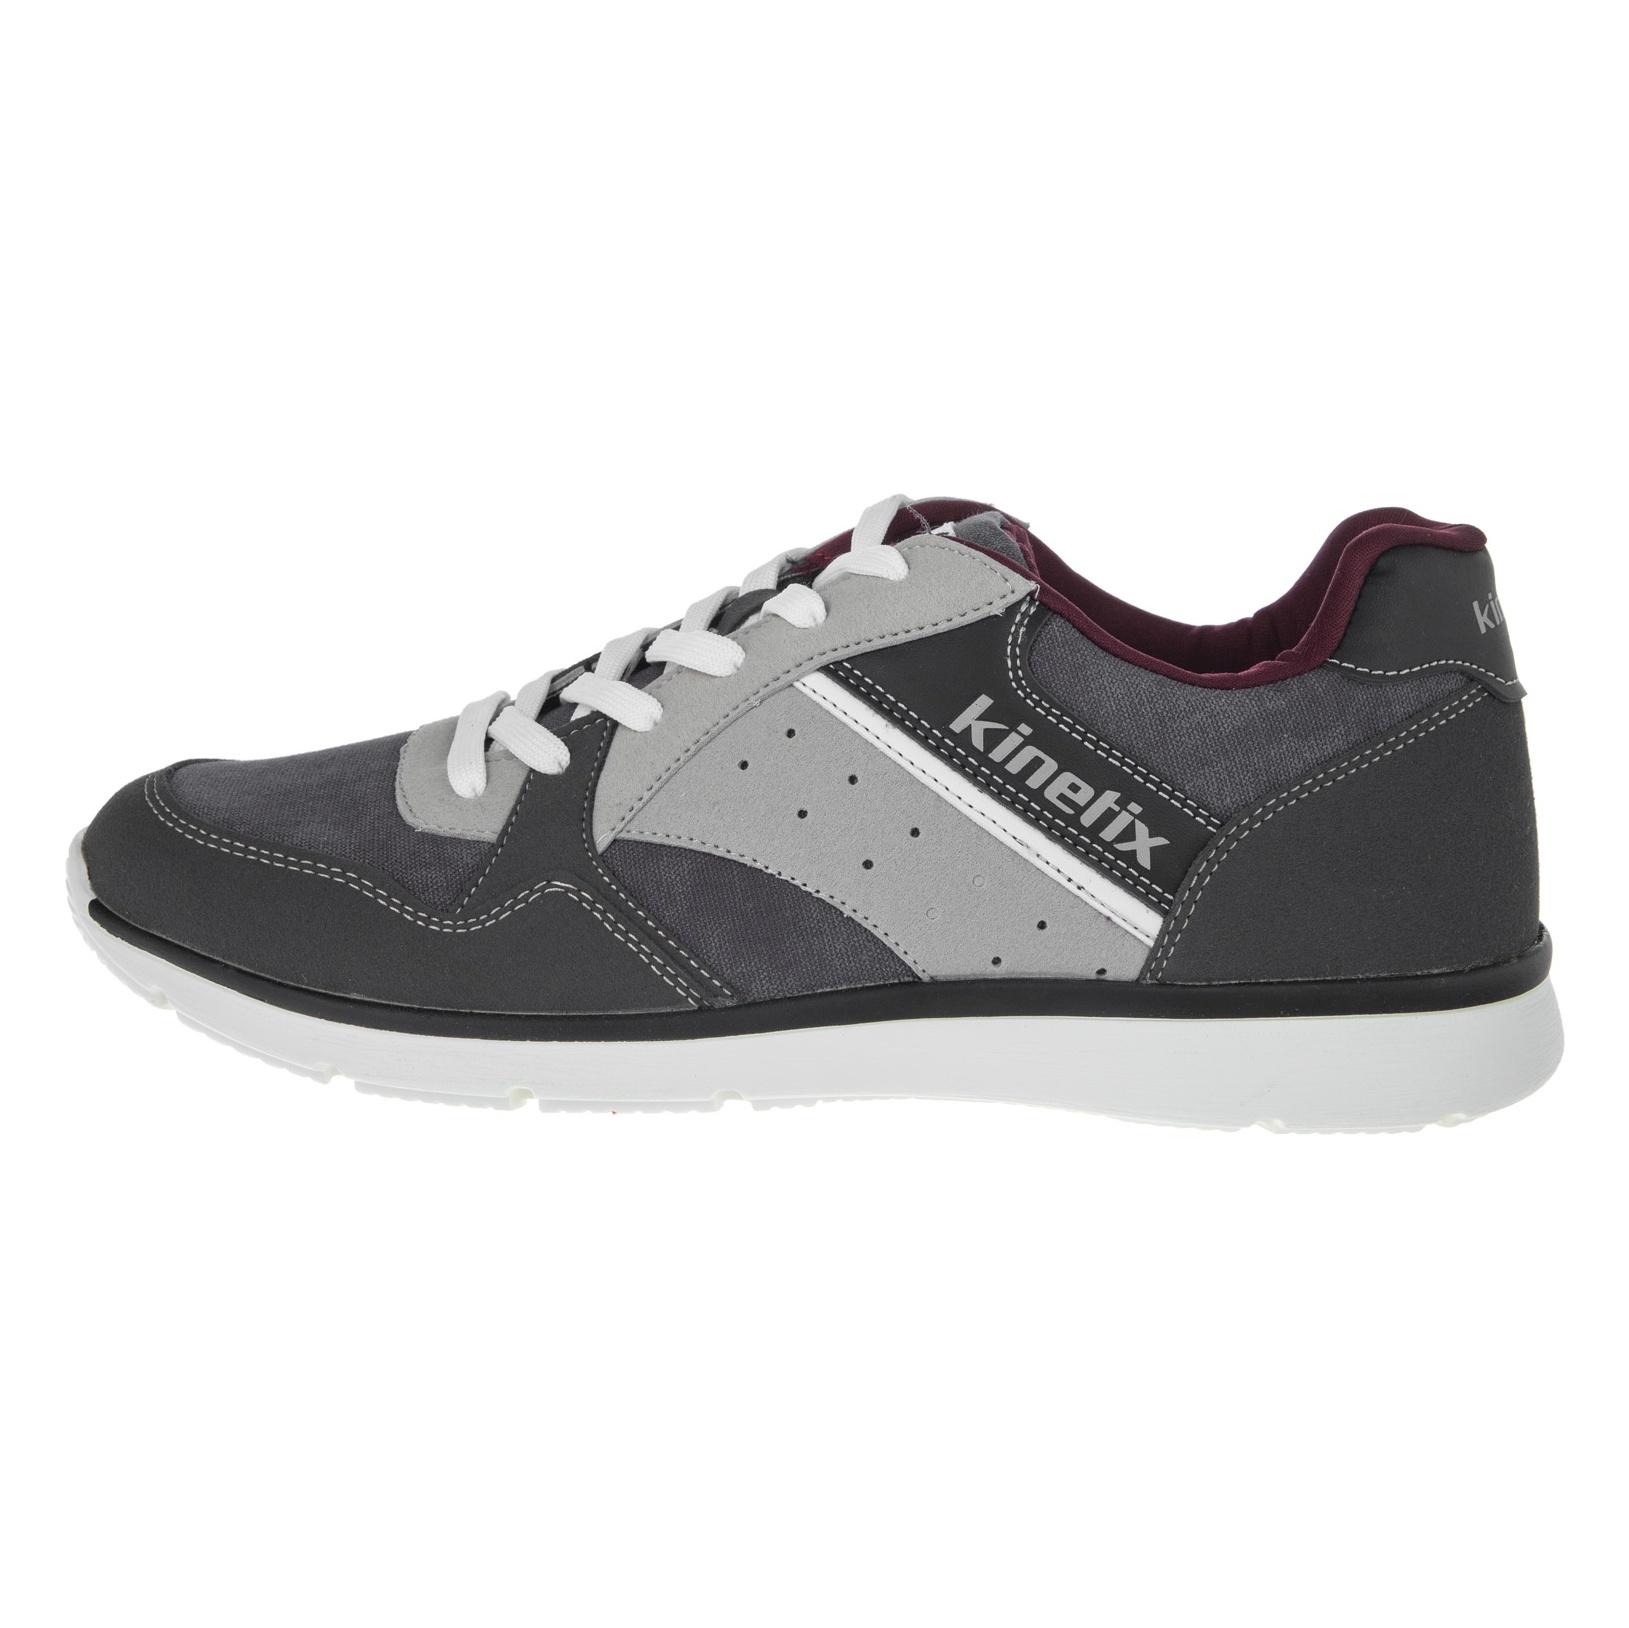 کفش روزمره مردانه کینتیکس مدل 100249871-109